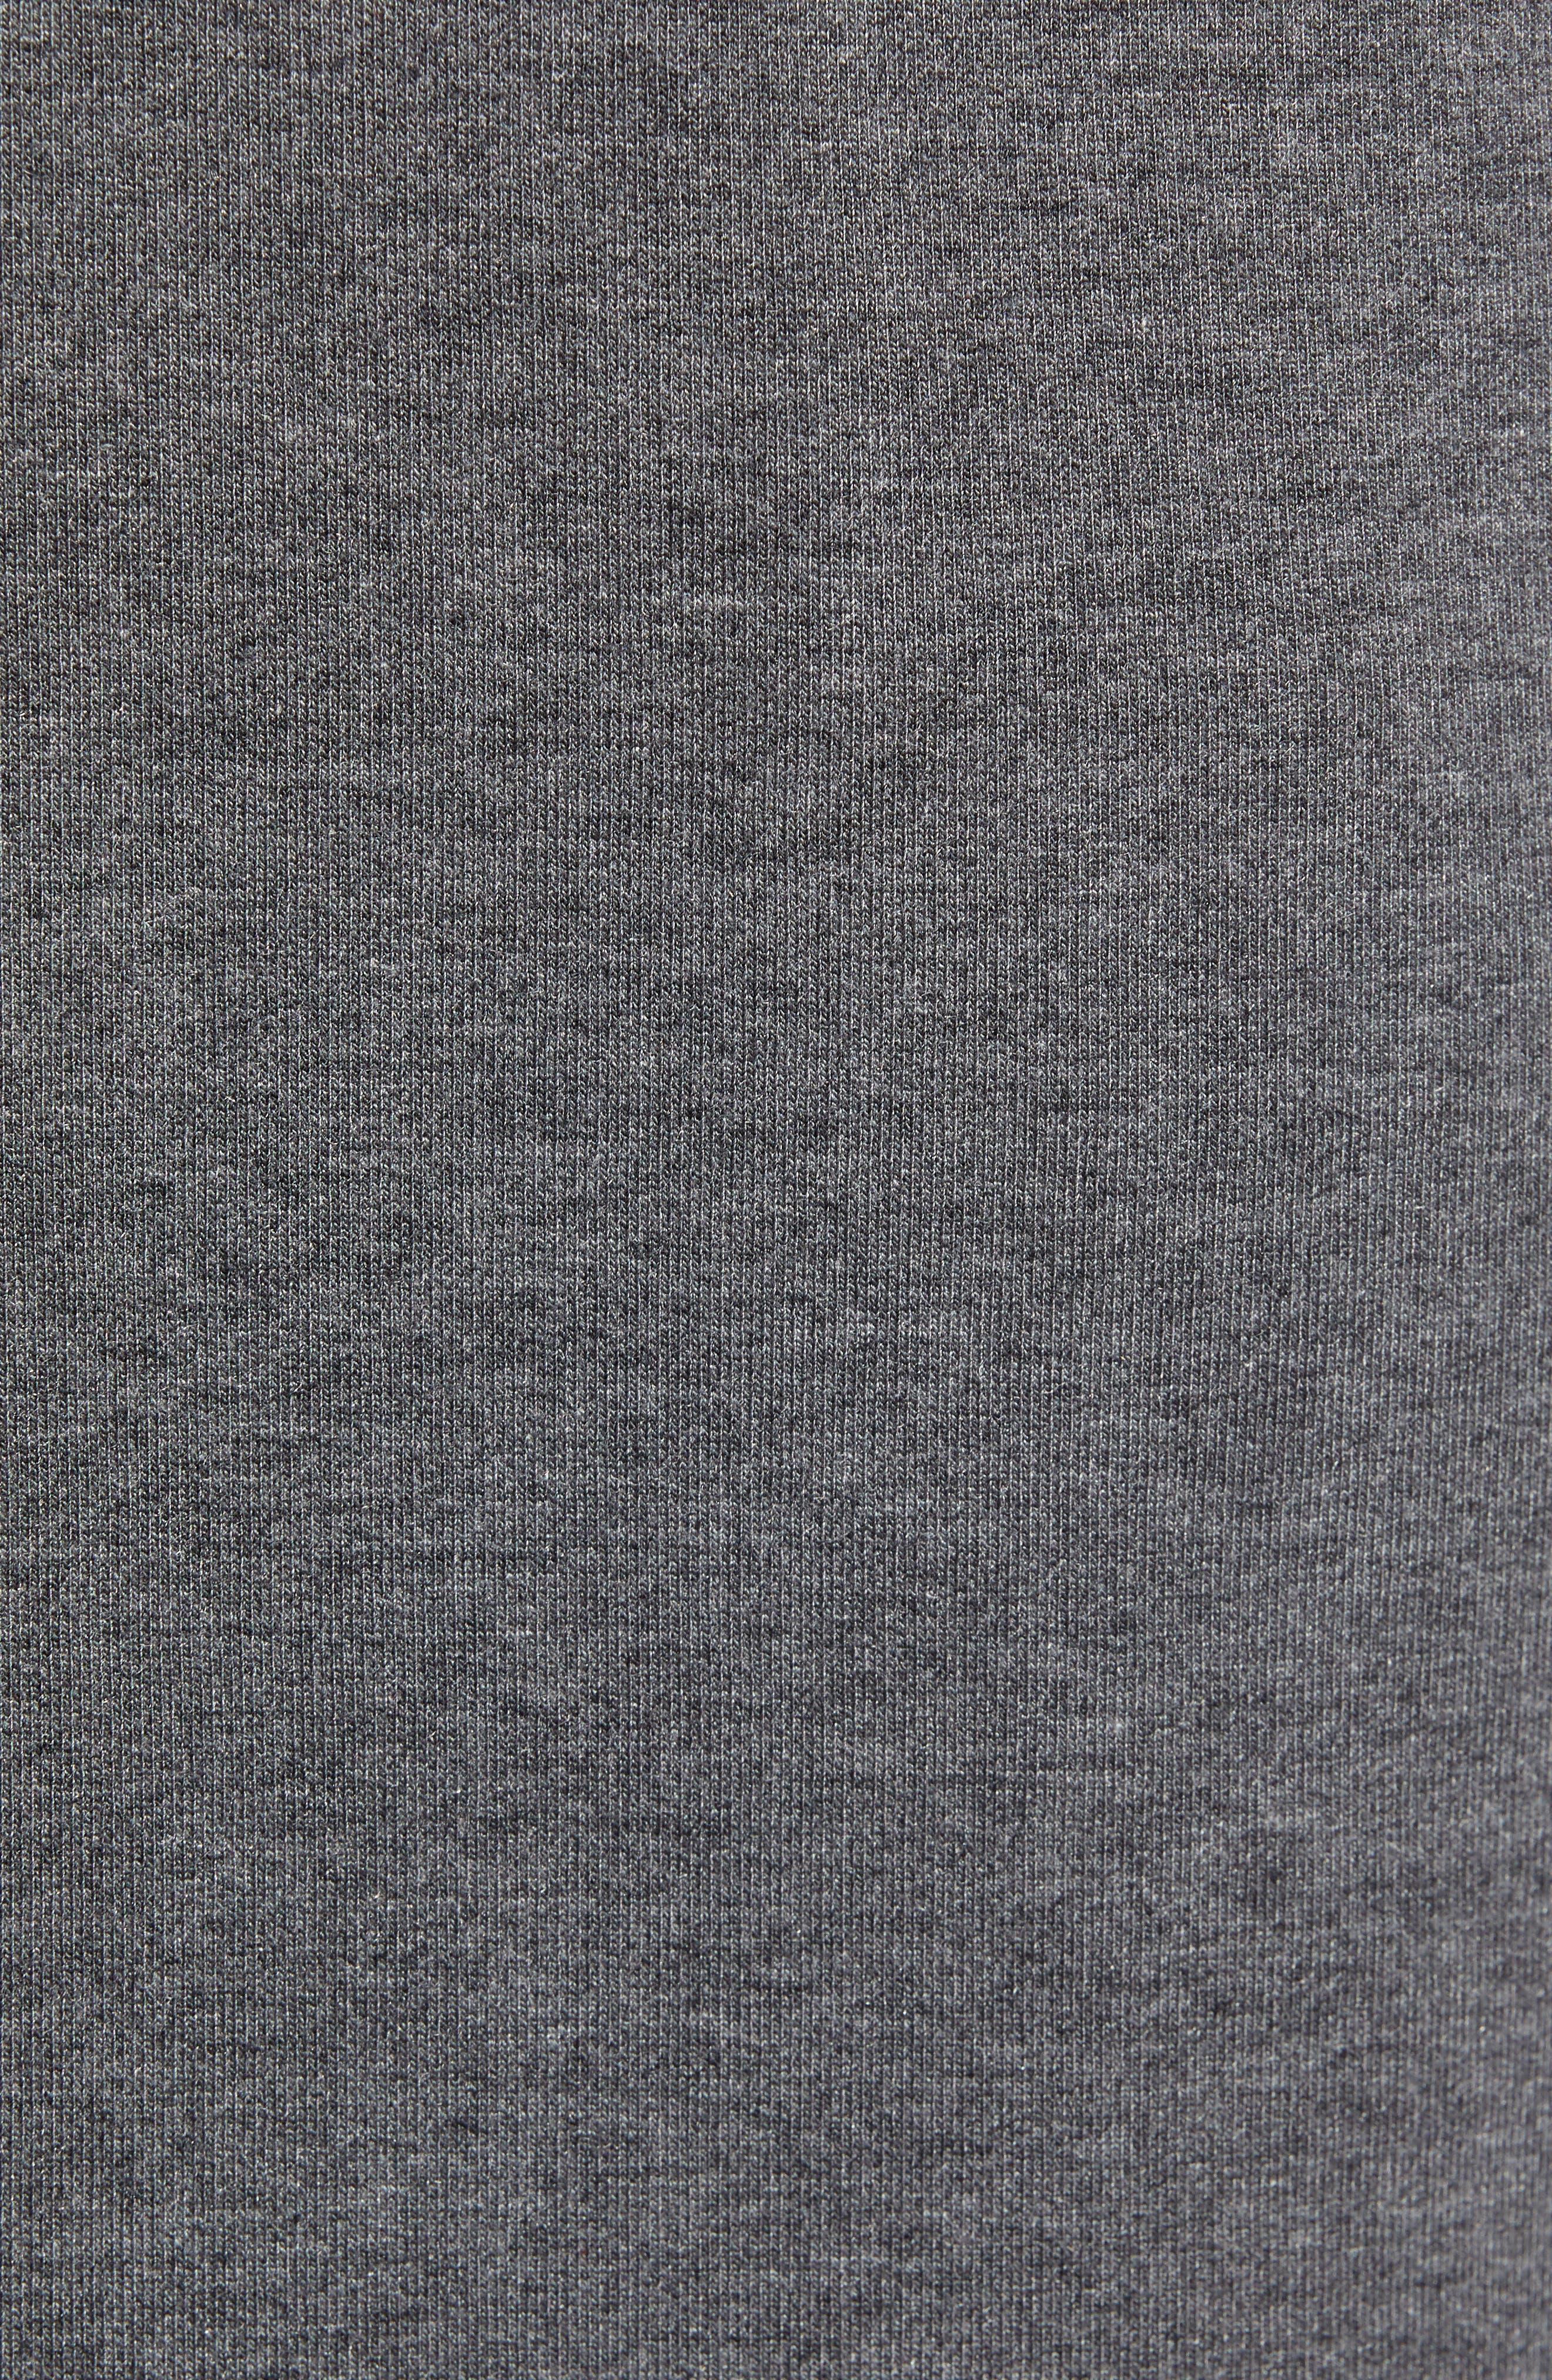 Modal Blend Lounge Shorts,                             Alternate thumbnail 5, color,                             CHARCOAL HEATHER